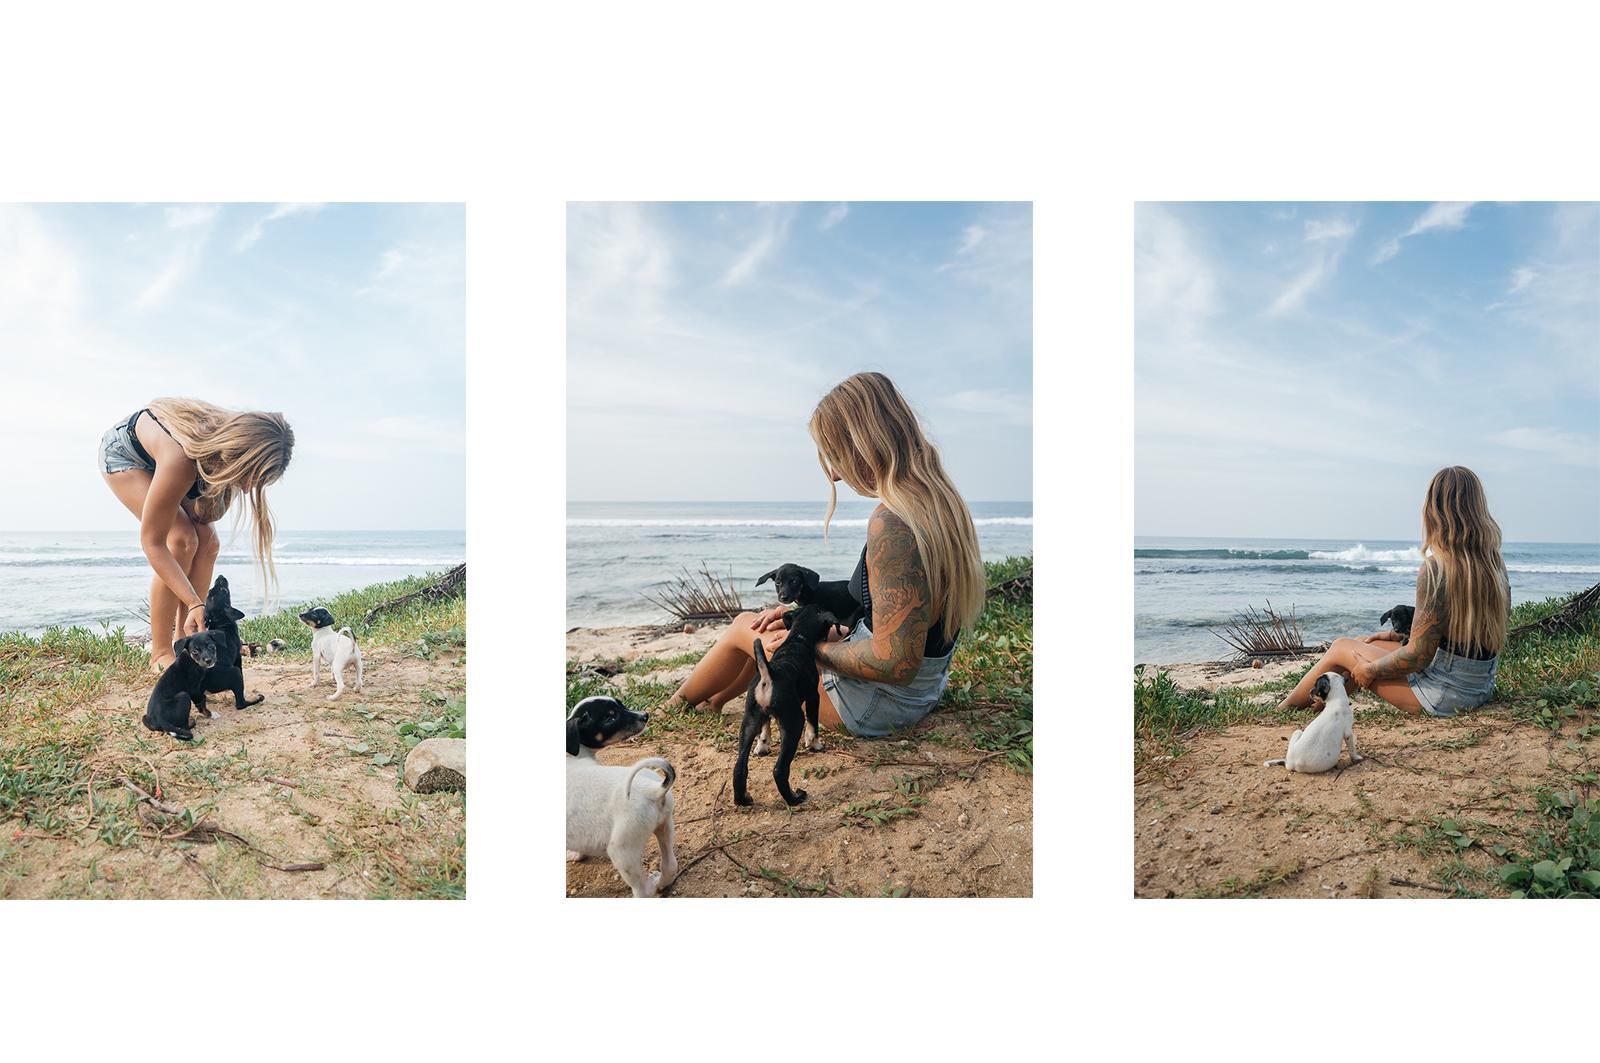 SriLanka_Dogs